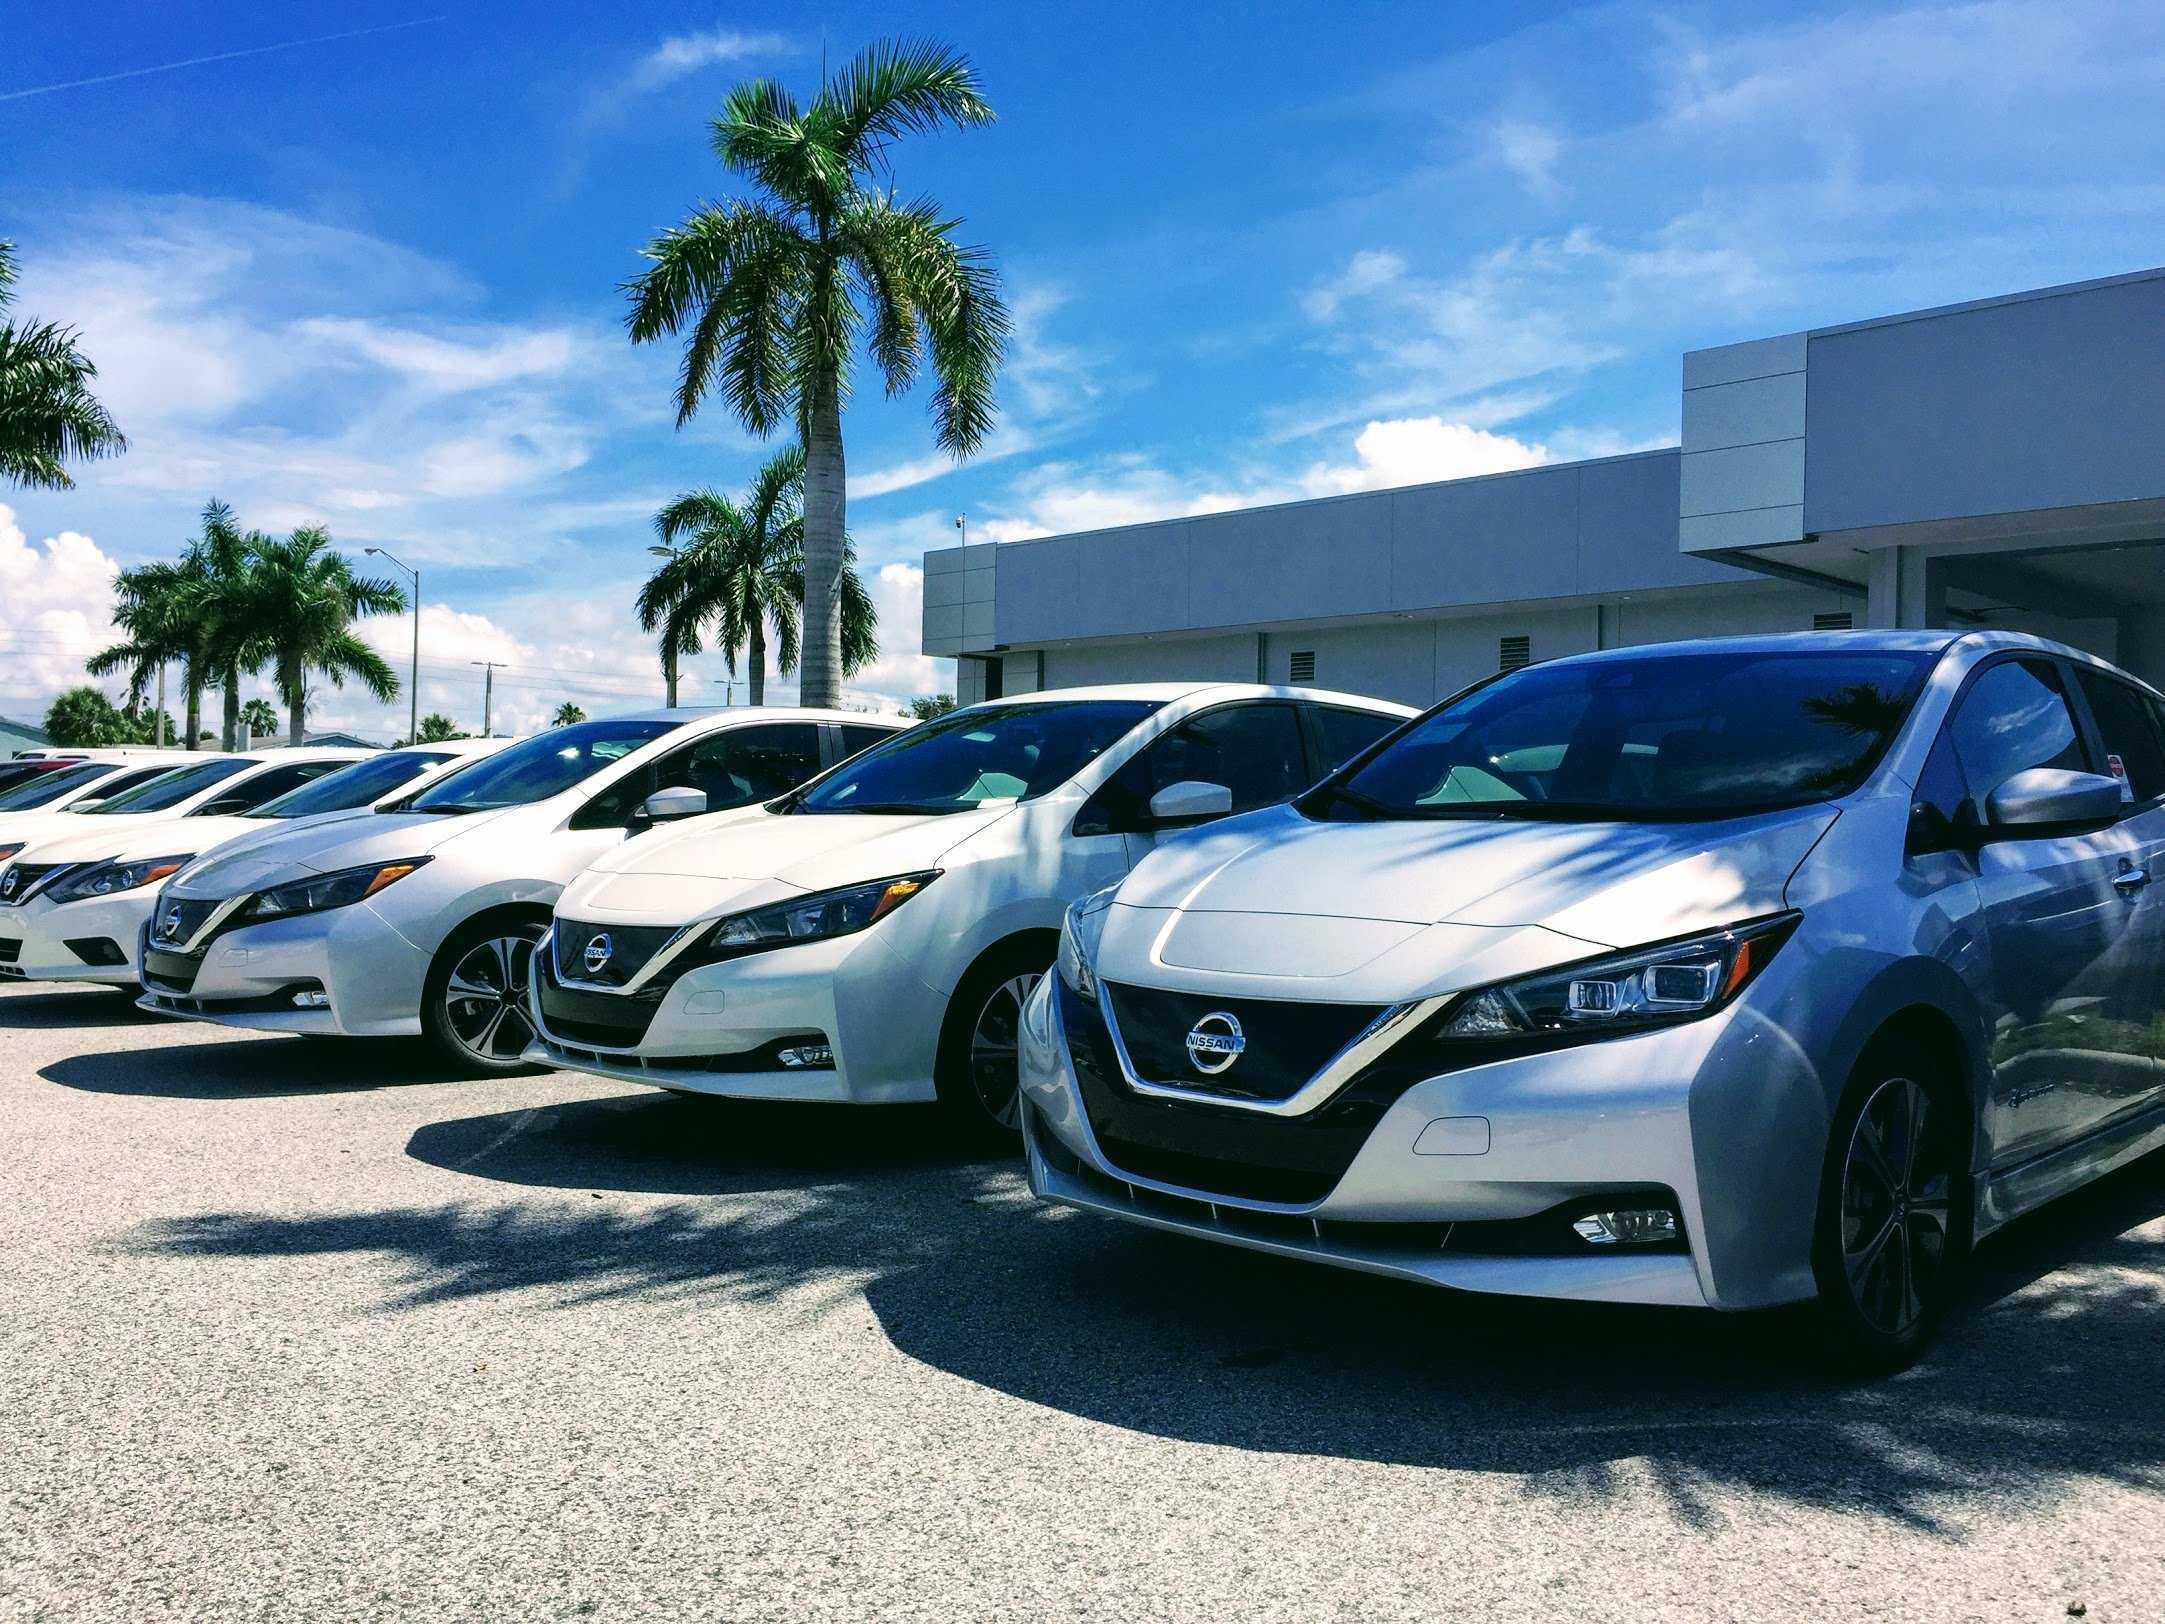 27 The 2020 Nissan Leaf E Plus Pricing with 2020 Nissan Leaf E Plus